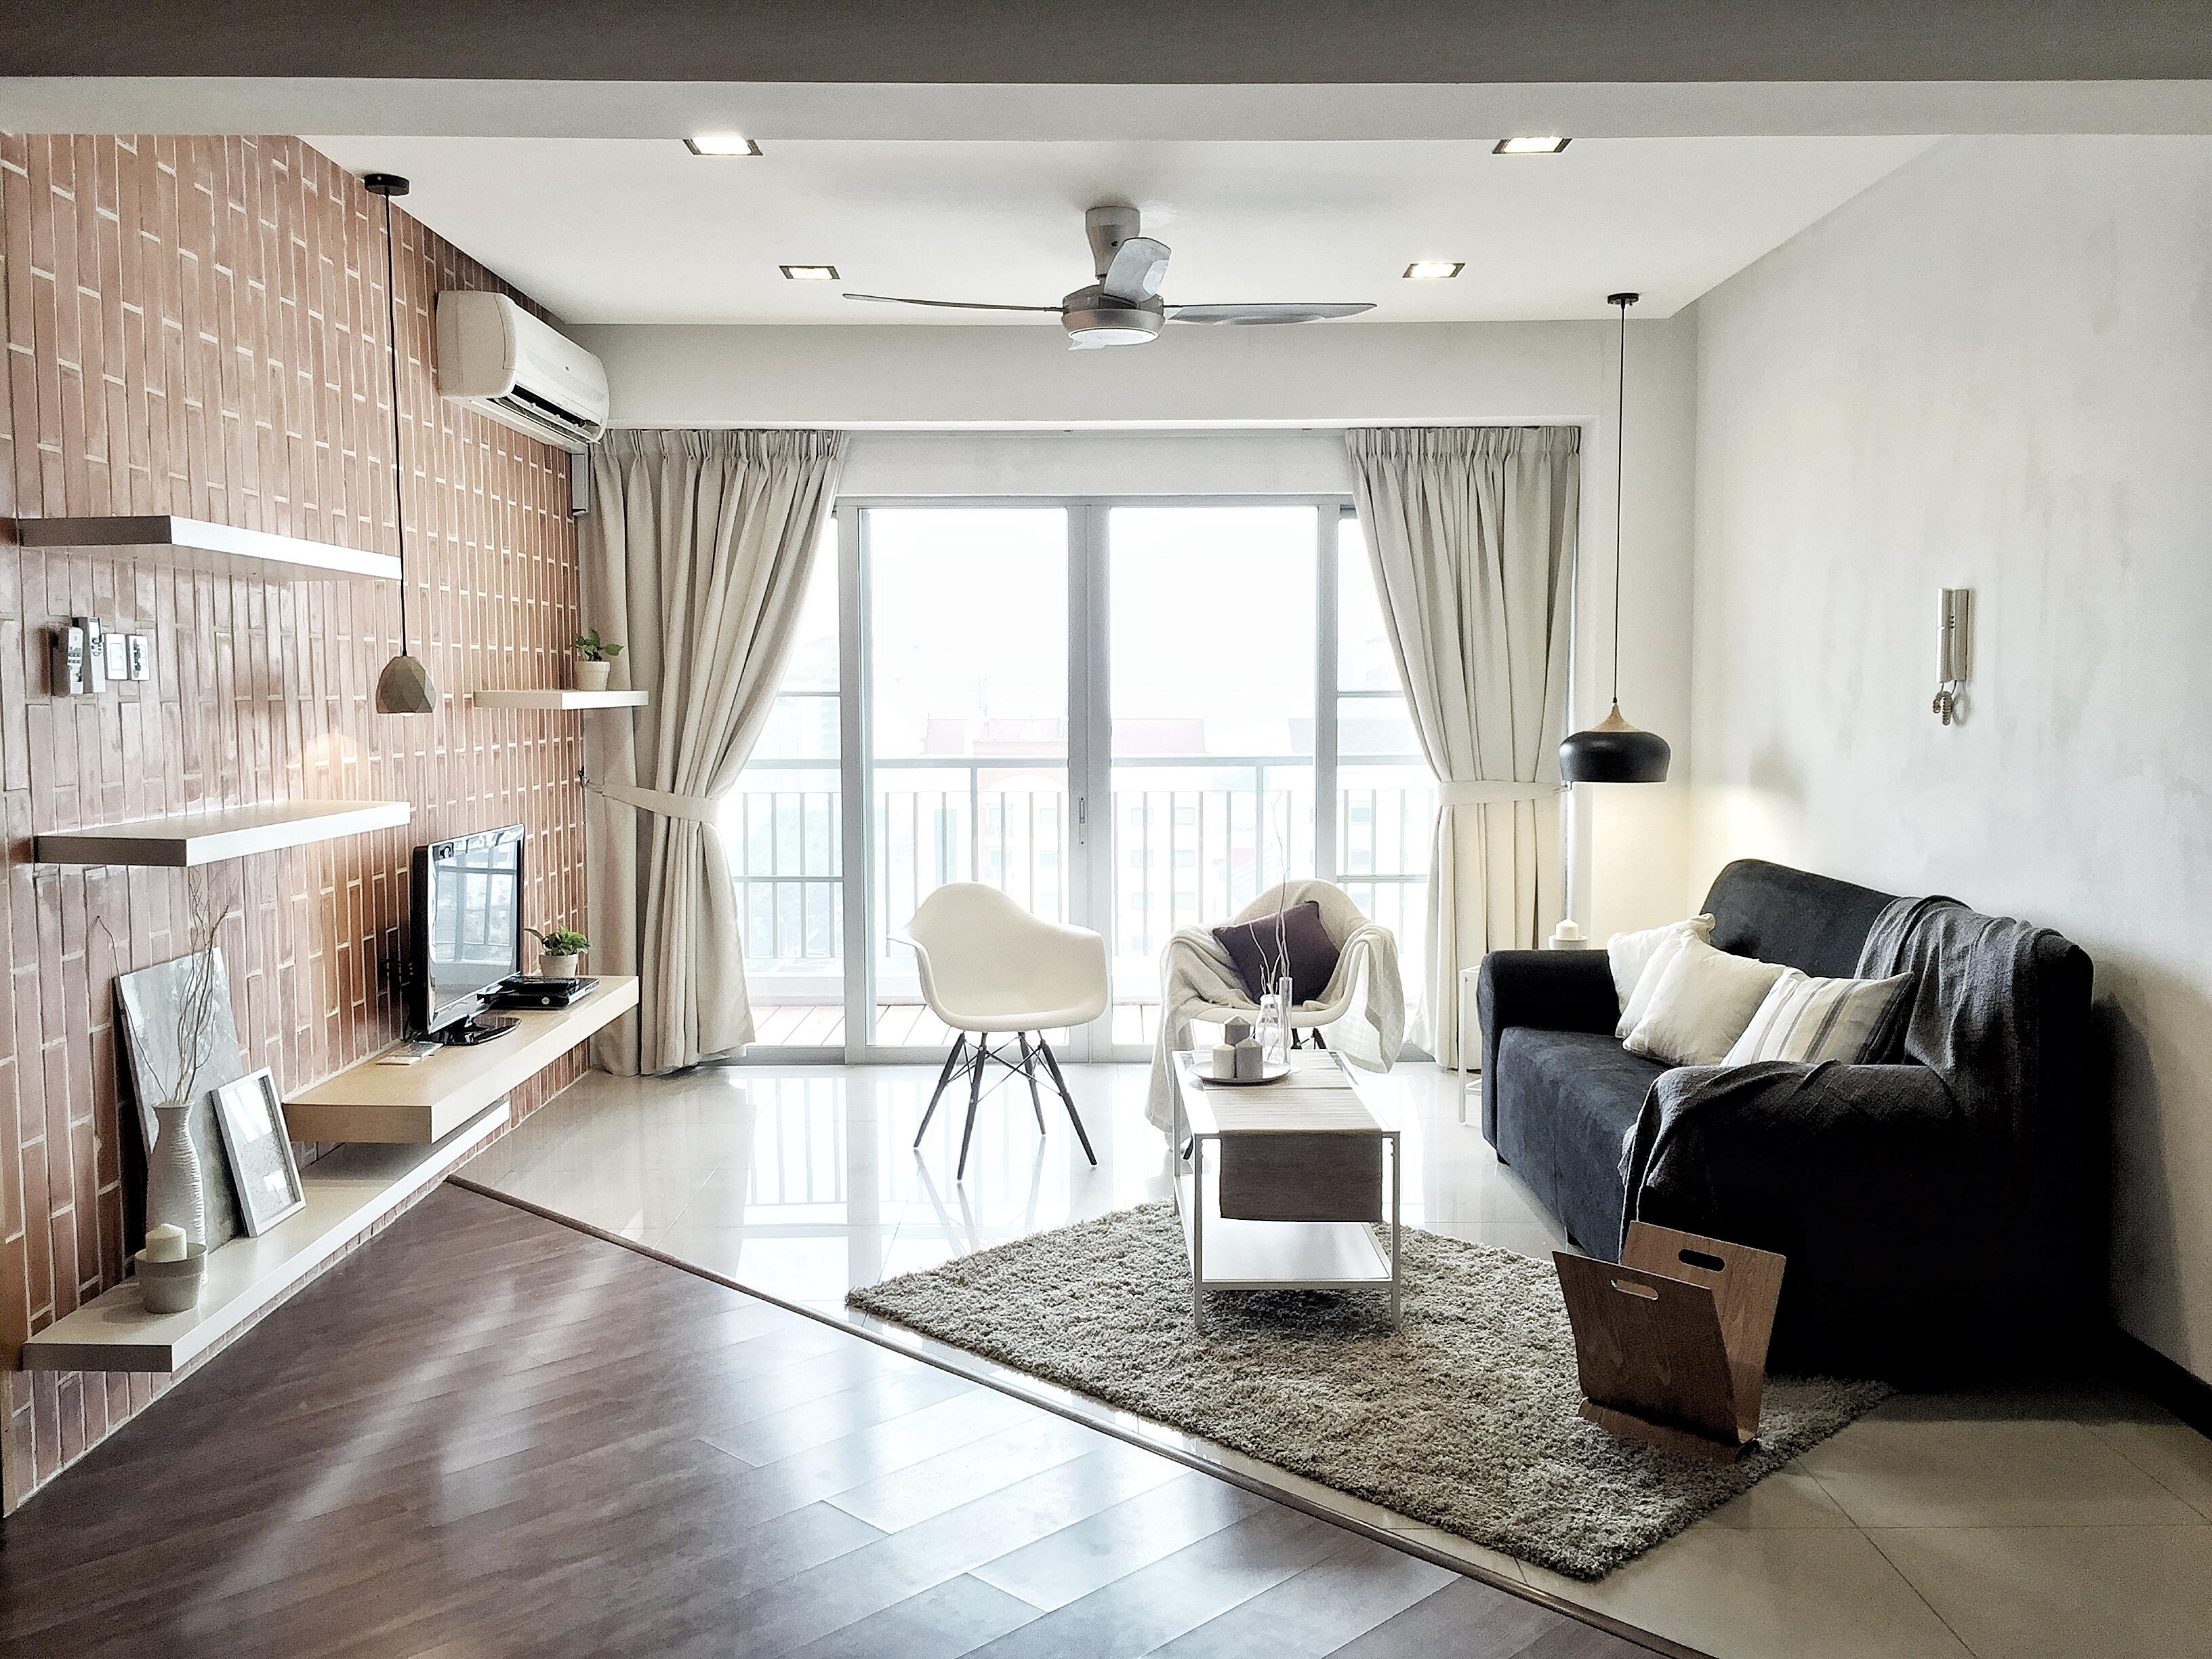 10 Effective Ways To Refurbish An Old Apartment